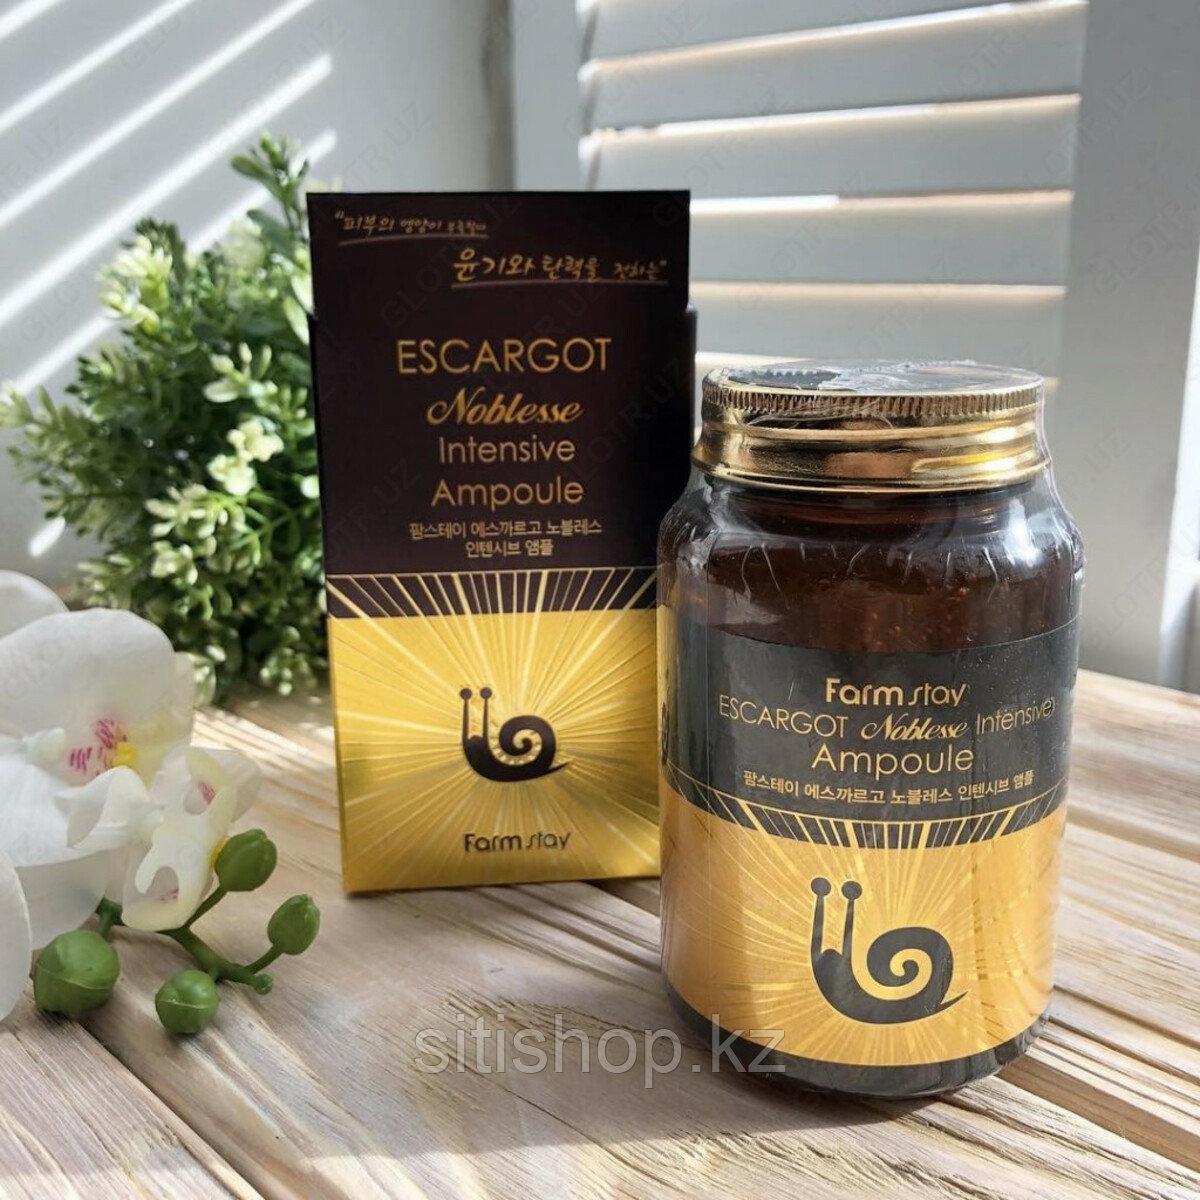 FarmStay Escargot Noblesse Intensive Ampoule - Сыворотка с экстрактом королевской улитки